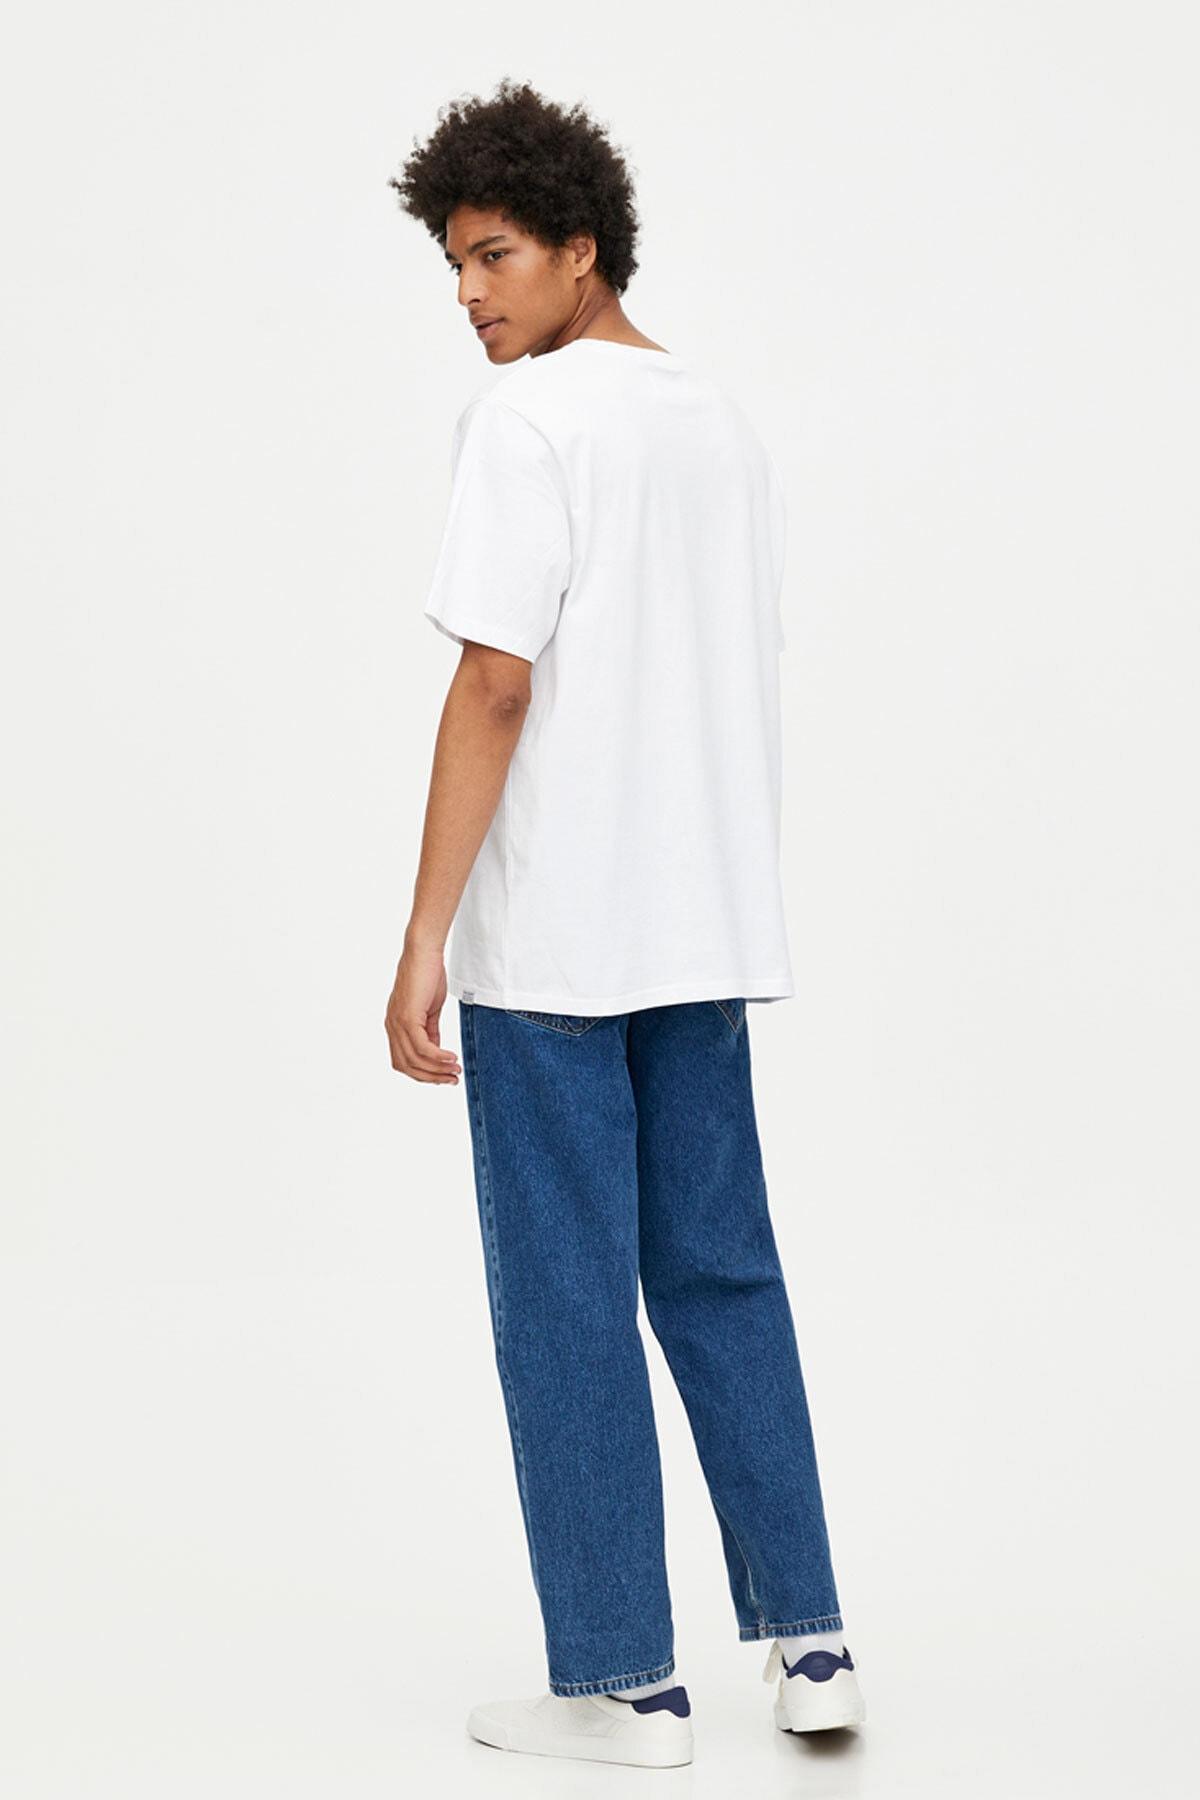 Pull & Bear Erkek Beyaz Join Life Basic T-Shirt 09244500 1